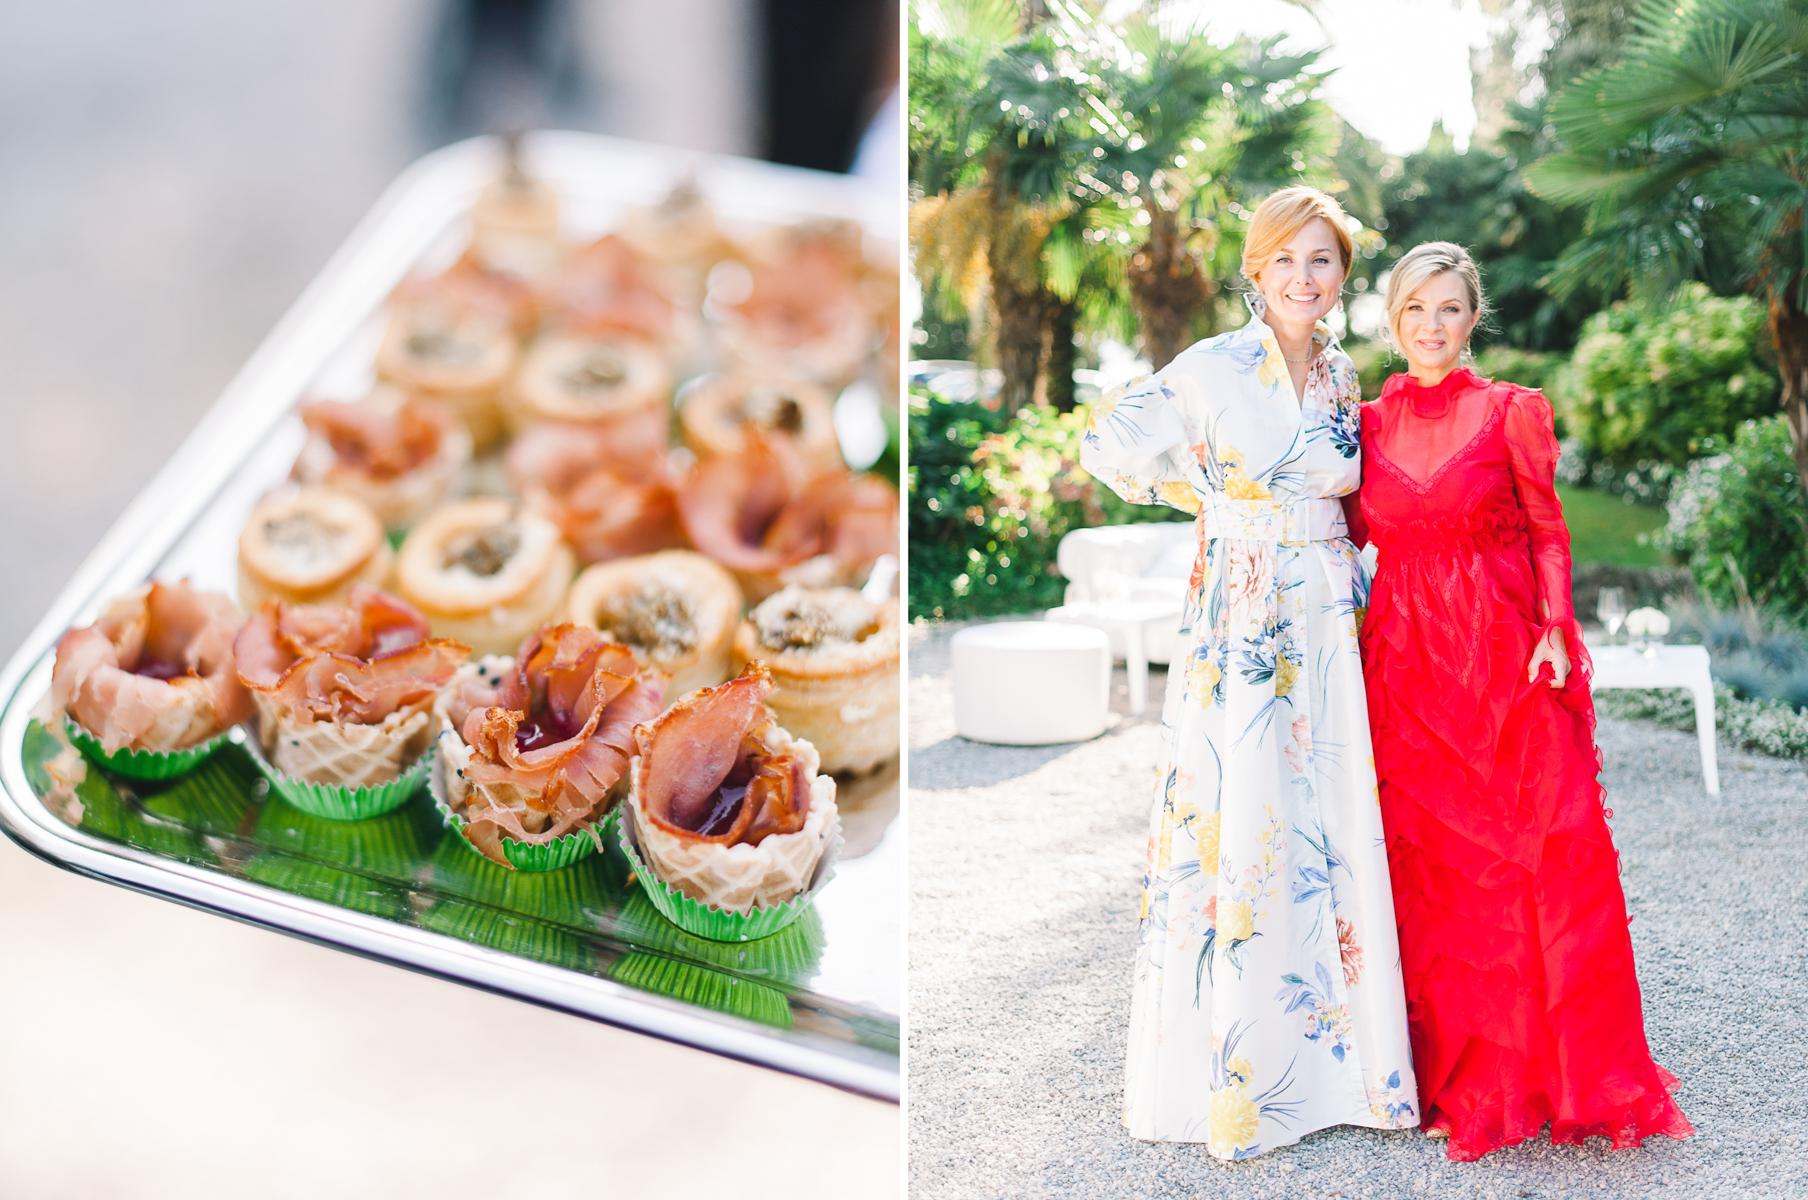 Palace_Villa_Cortine_Hotel_Italian_Wedding_Photographer_Sirmione_AKP-26-Aldo_Coppola.jpg